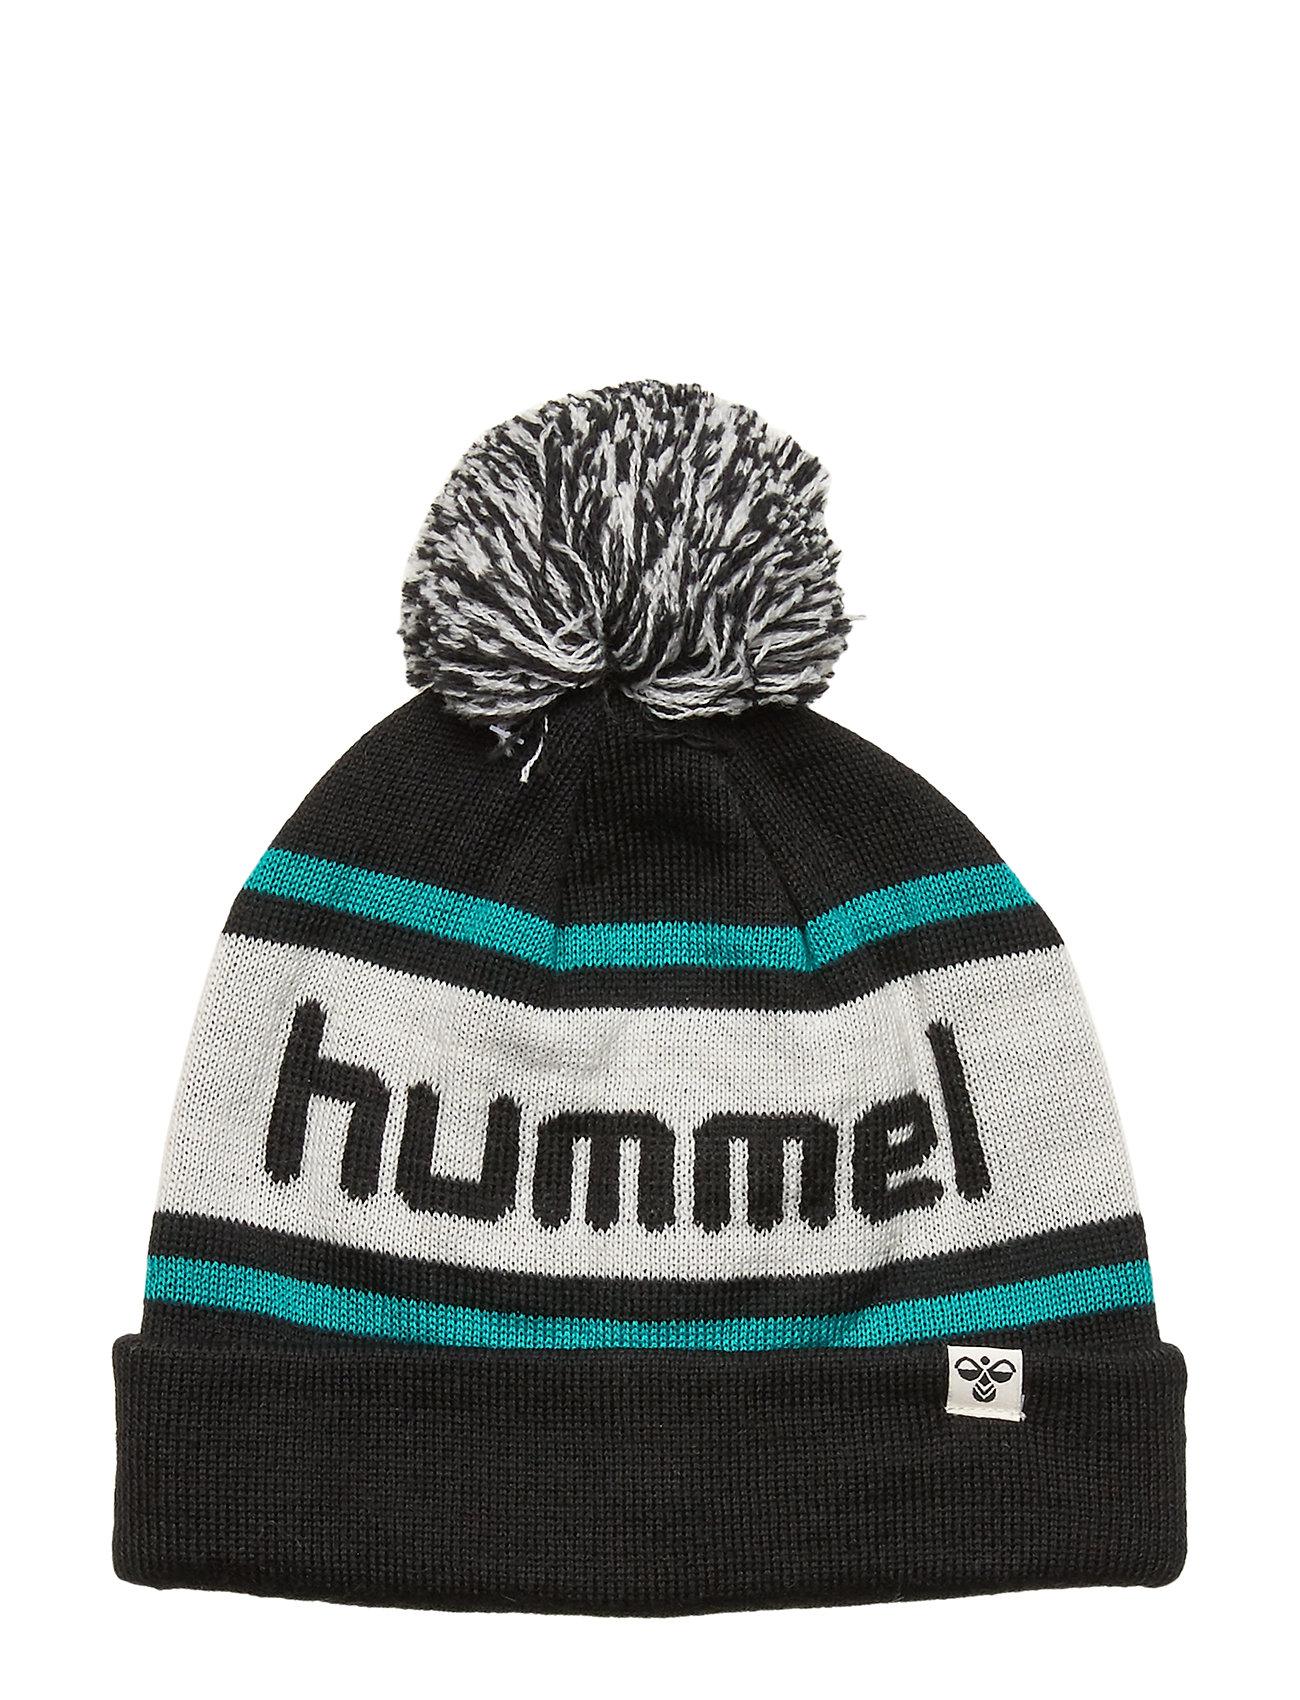 Hummel hmlTOWN BEANIE - BLACK/LAKE BLUE